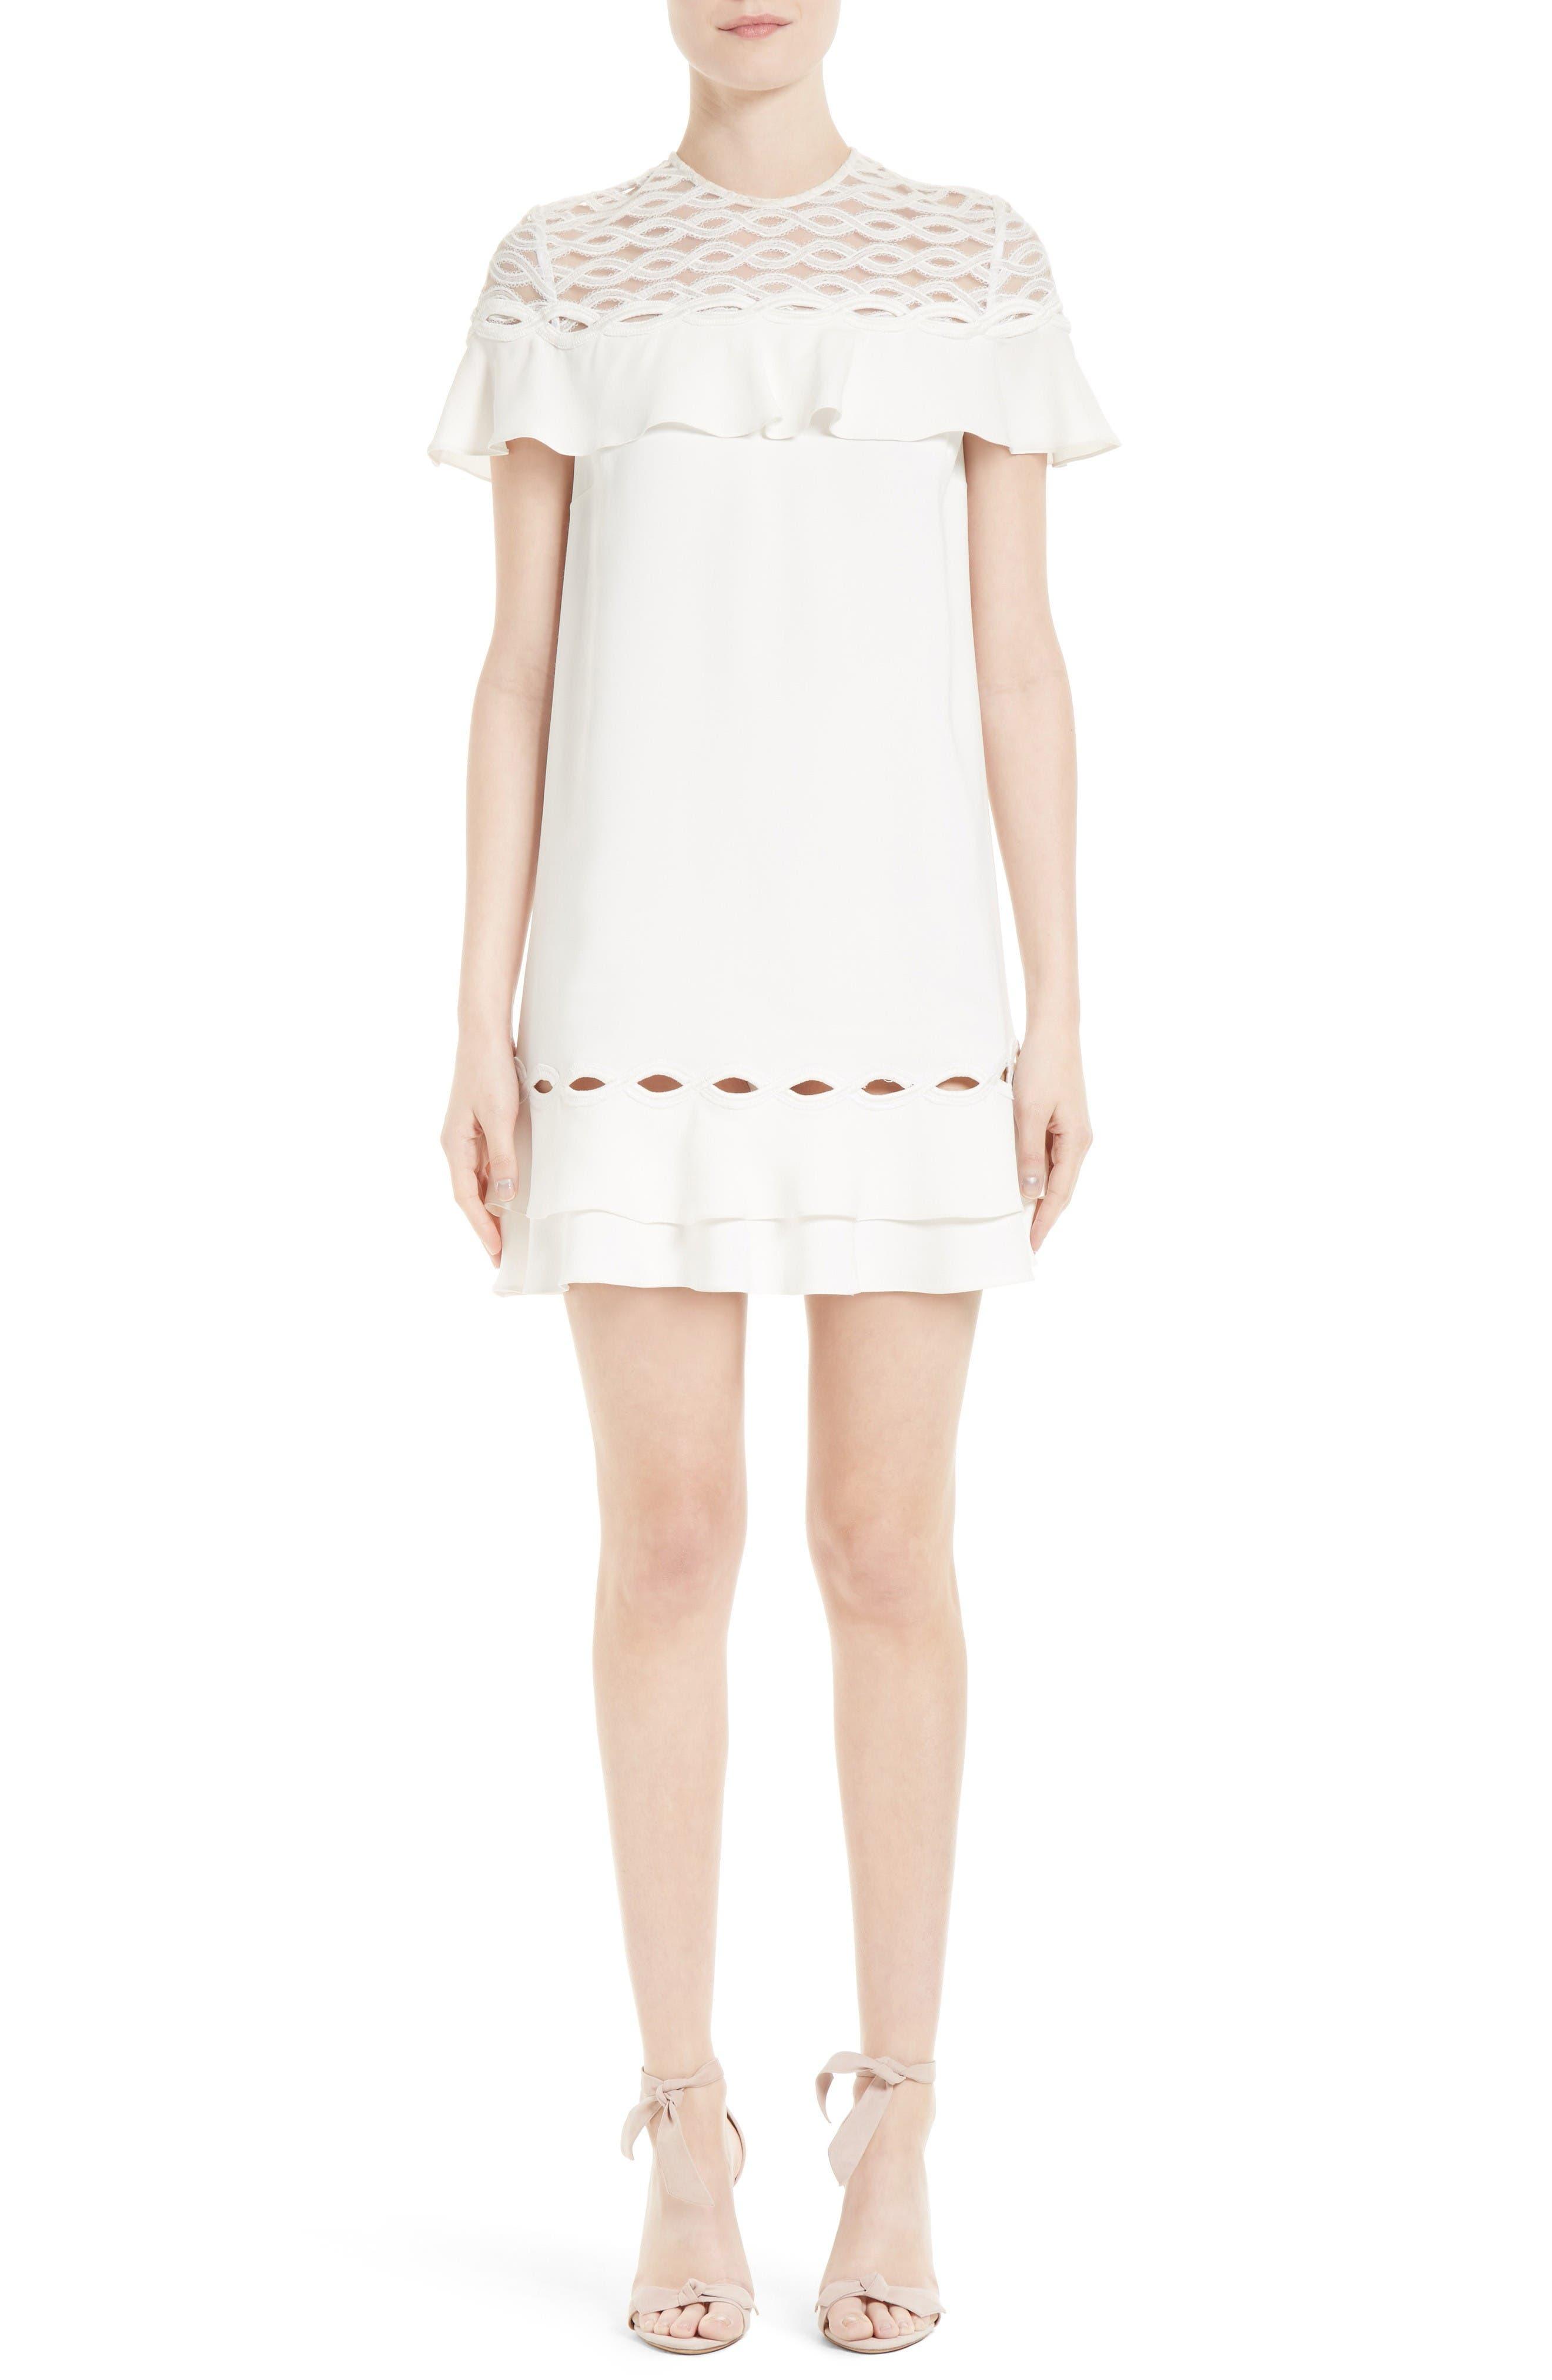 Alternate Image 1 Selected - Jonathan Simkhai Rope Appliqué Ruffle Dress